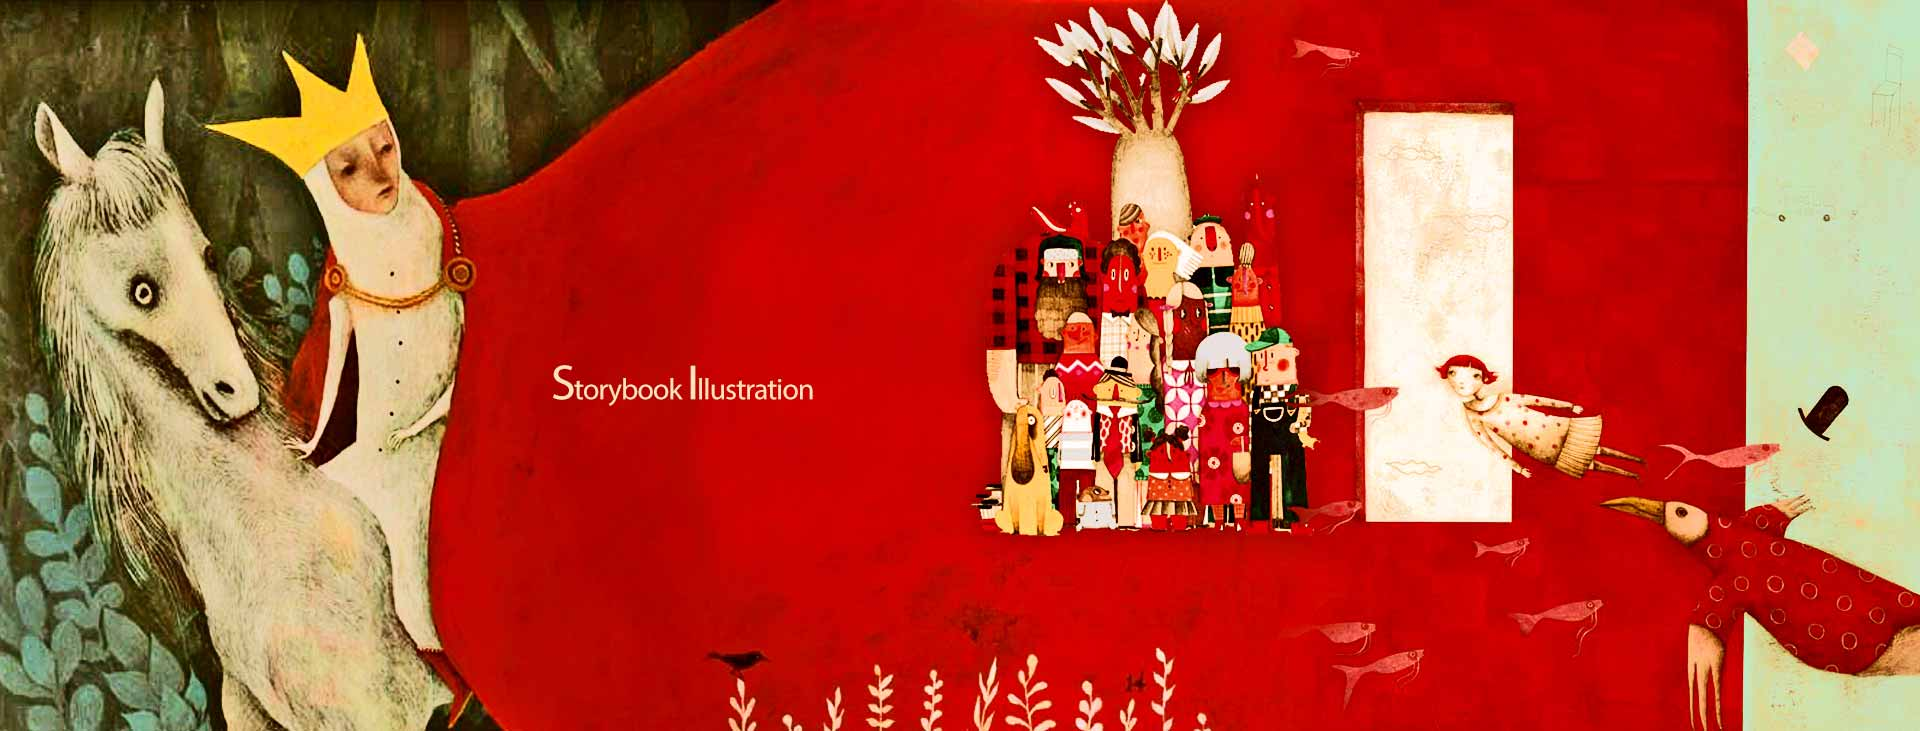 Storybook Illustration 2 - تصویرگری متن کتاب داستان